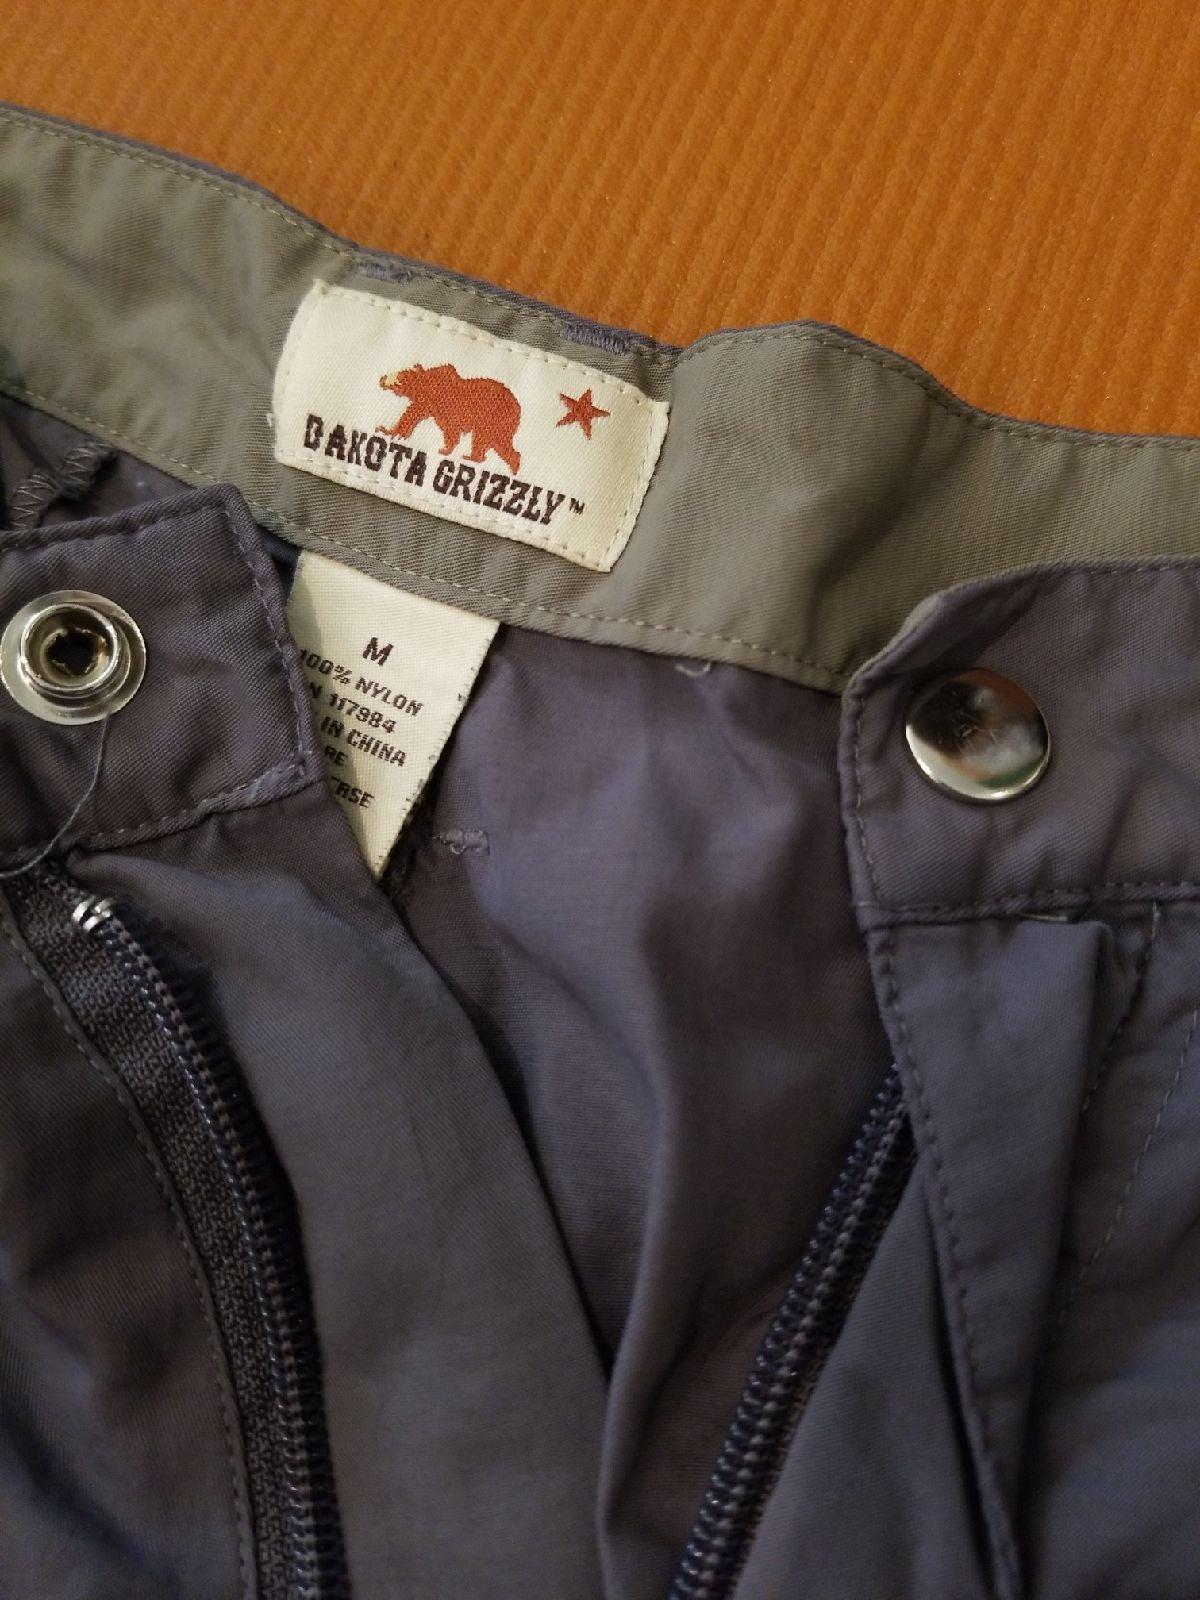 Convertible to shorts, men's hiking pant